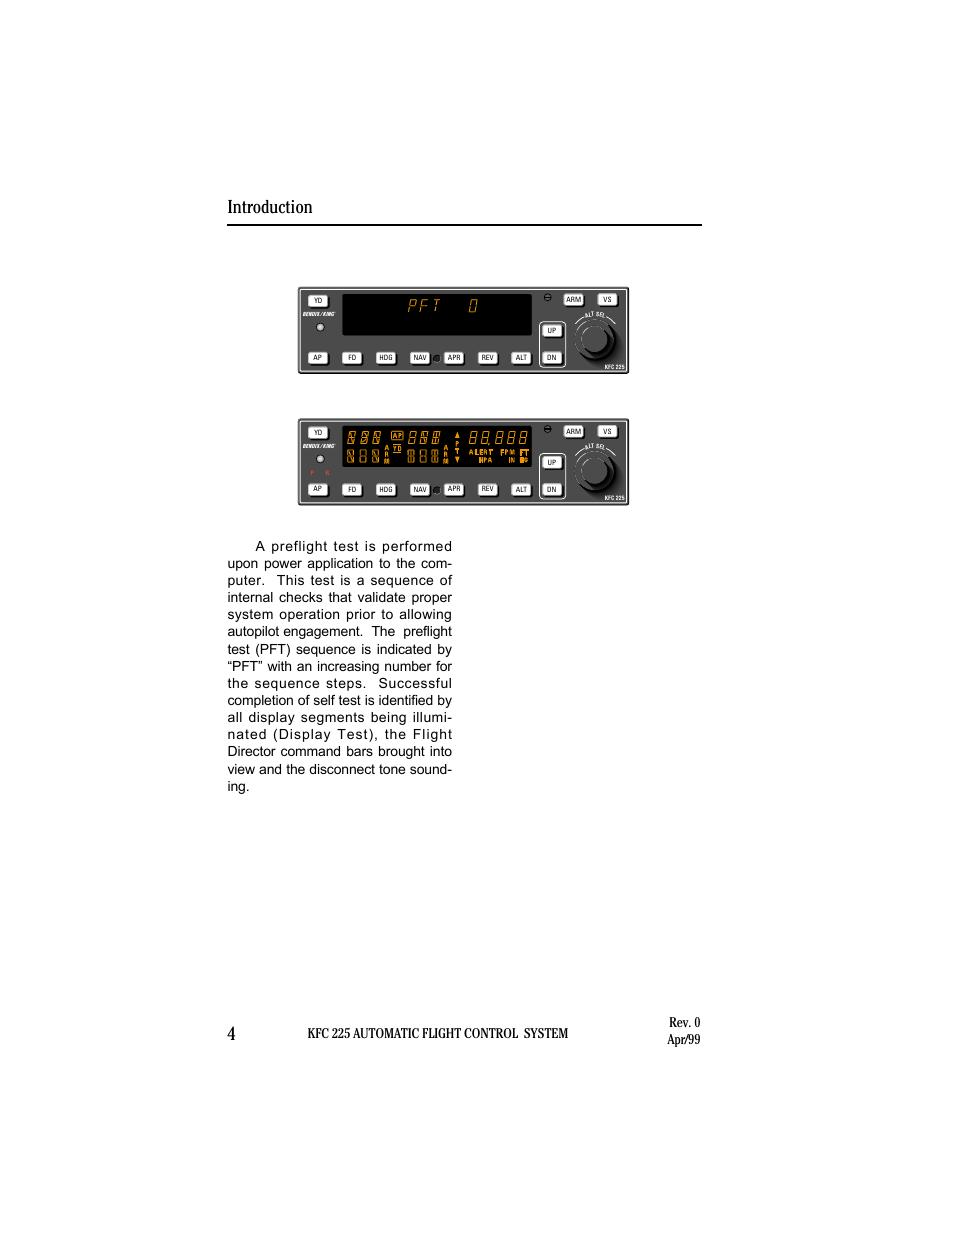 power application and preflight tests introduction 4 kfc 225 rh manualsdir com Bendix King Radio Schematic Bendix King KX 125